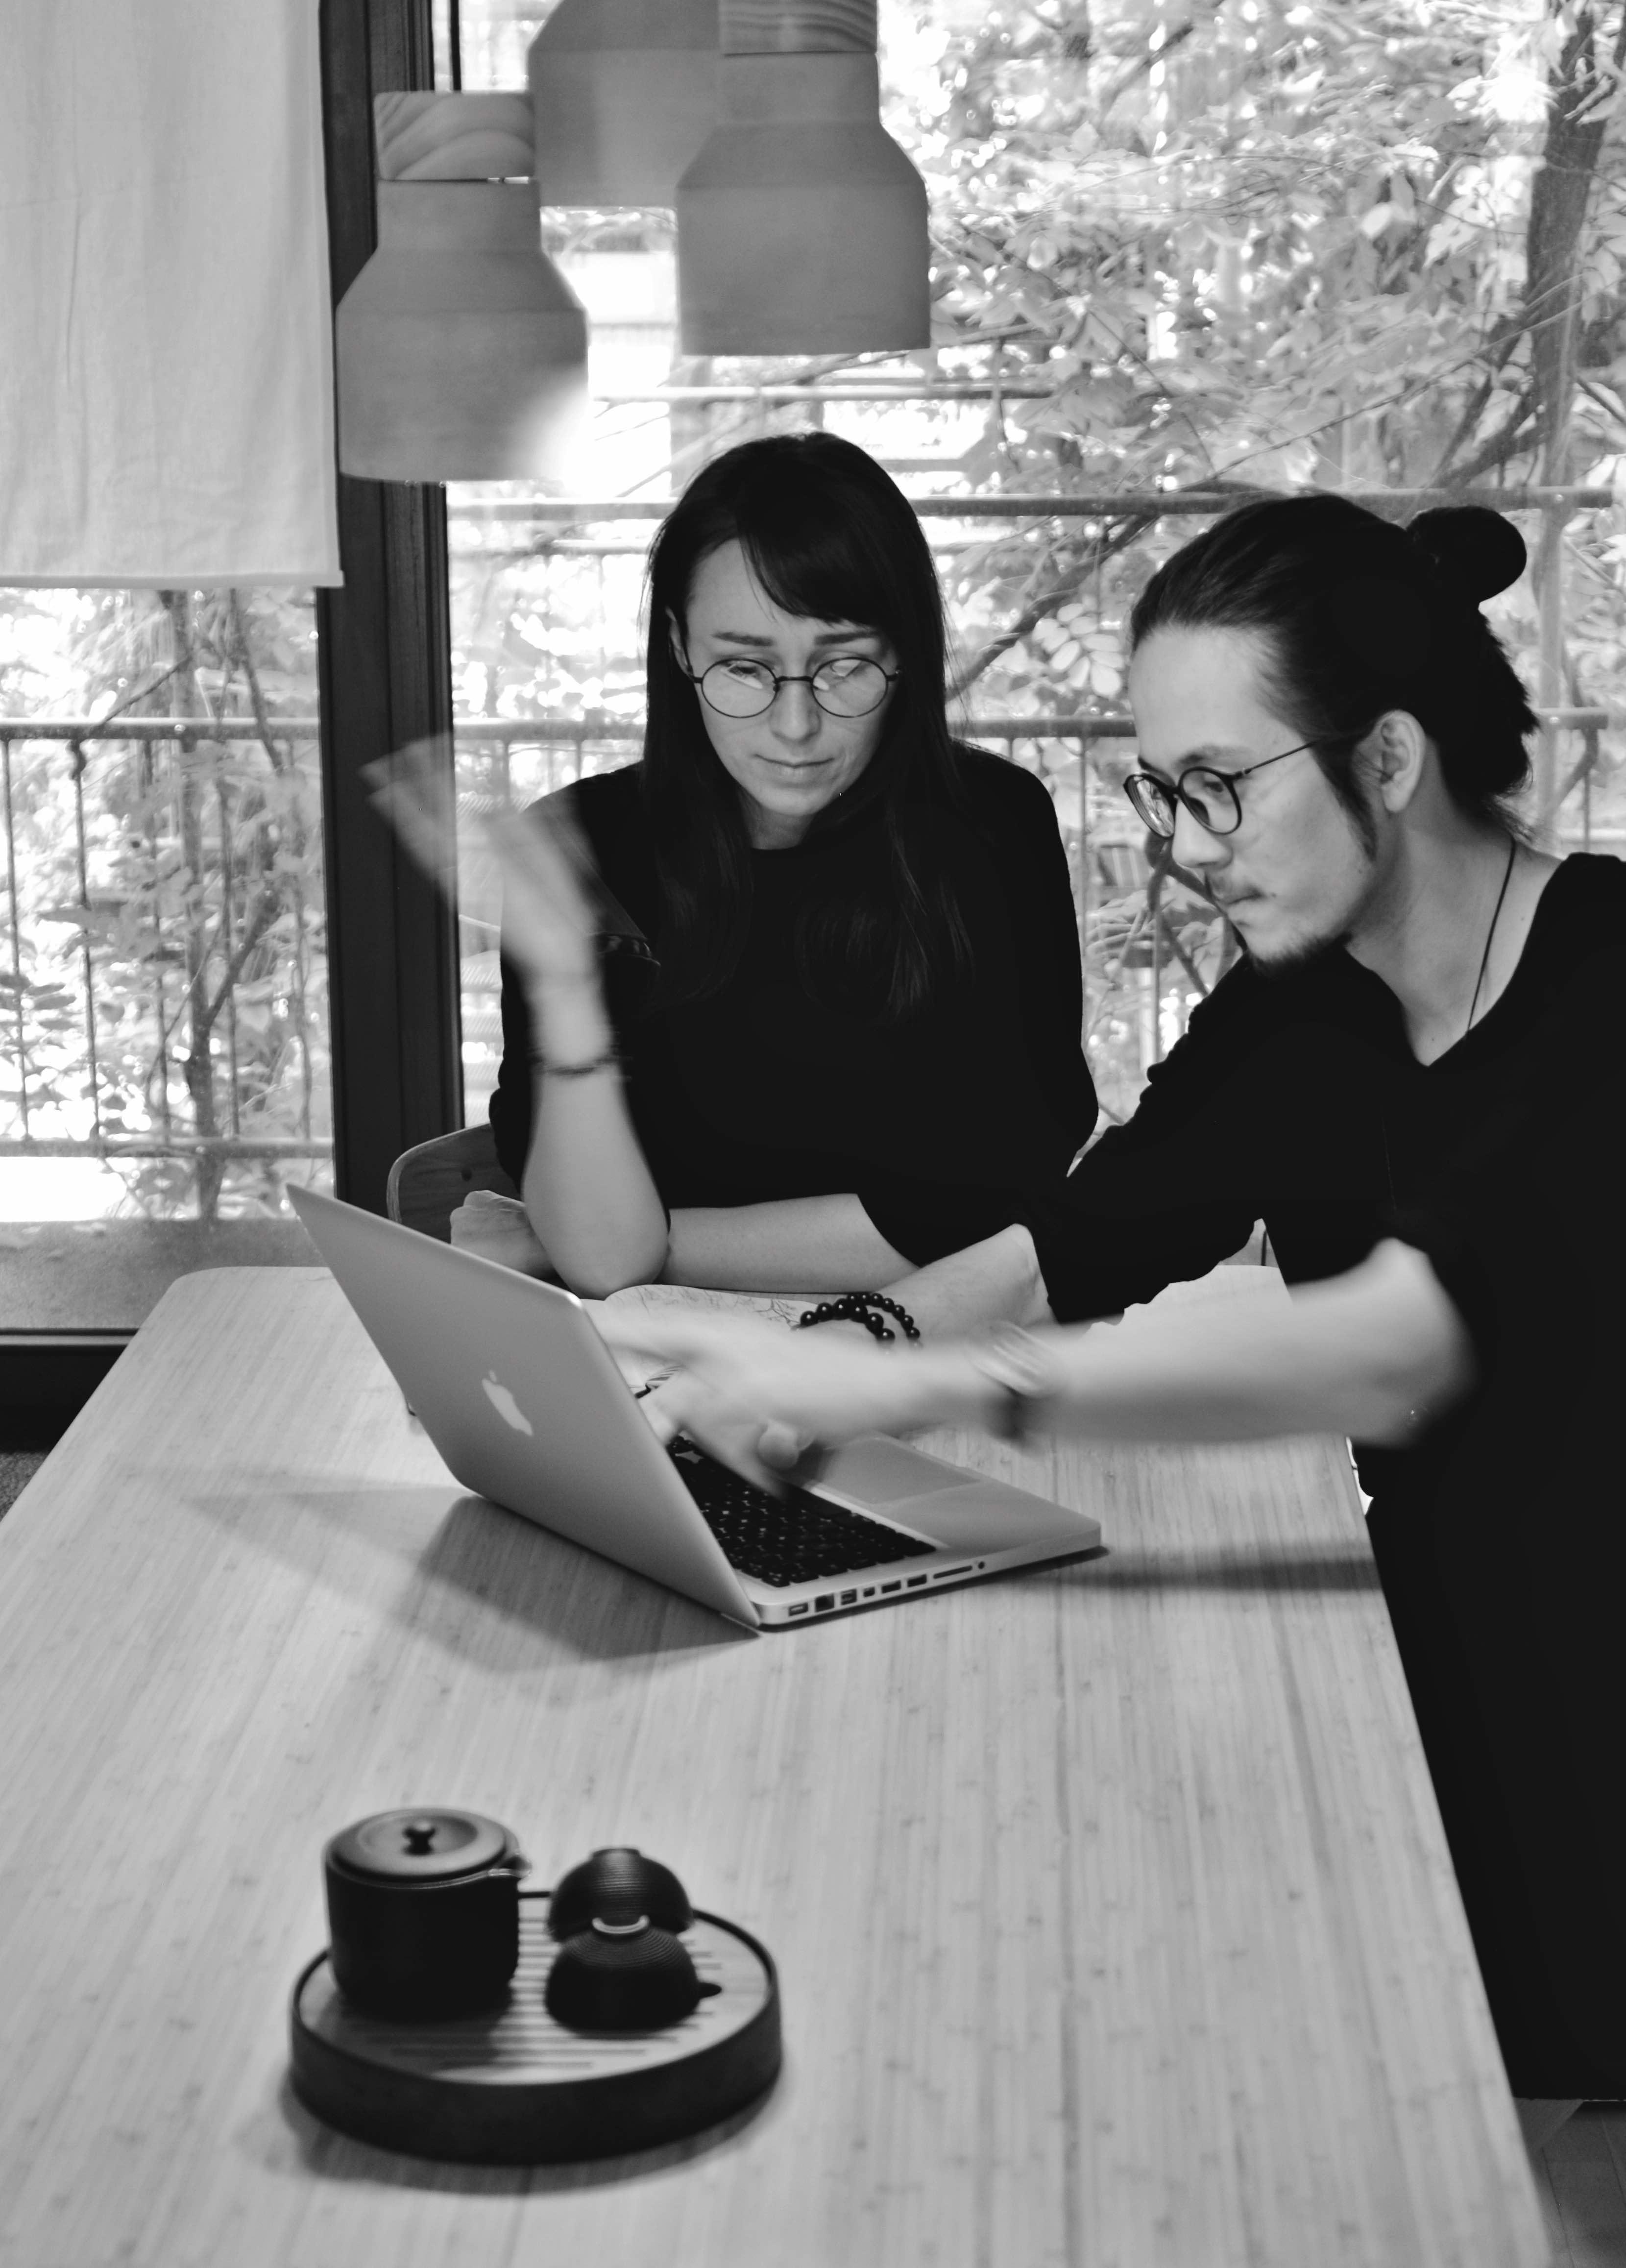 Design in Konstanz. Endformat Designstudio. Pascal Rüttenauer & Christina Weinbrenner